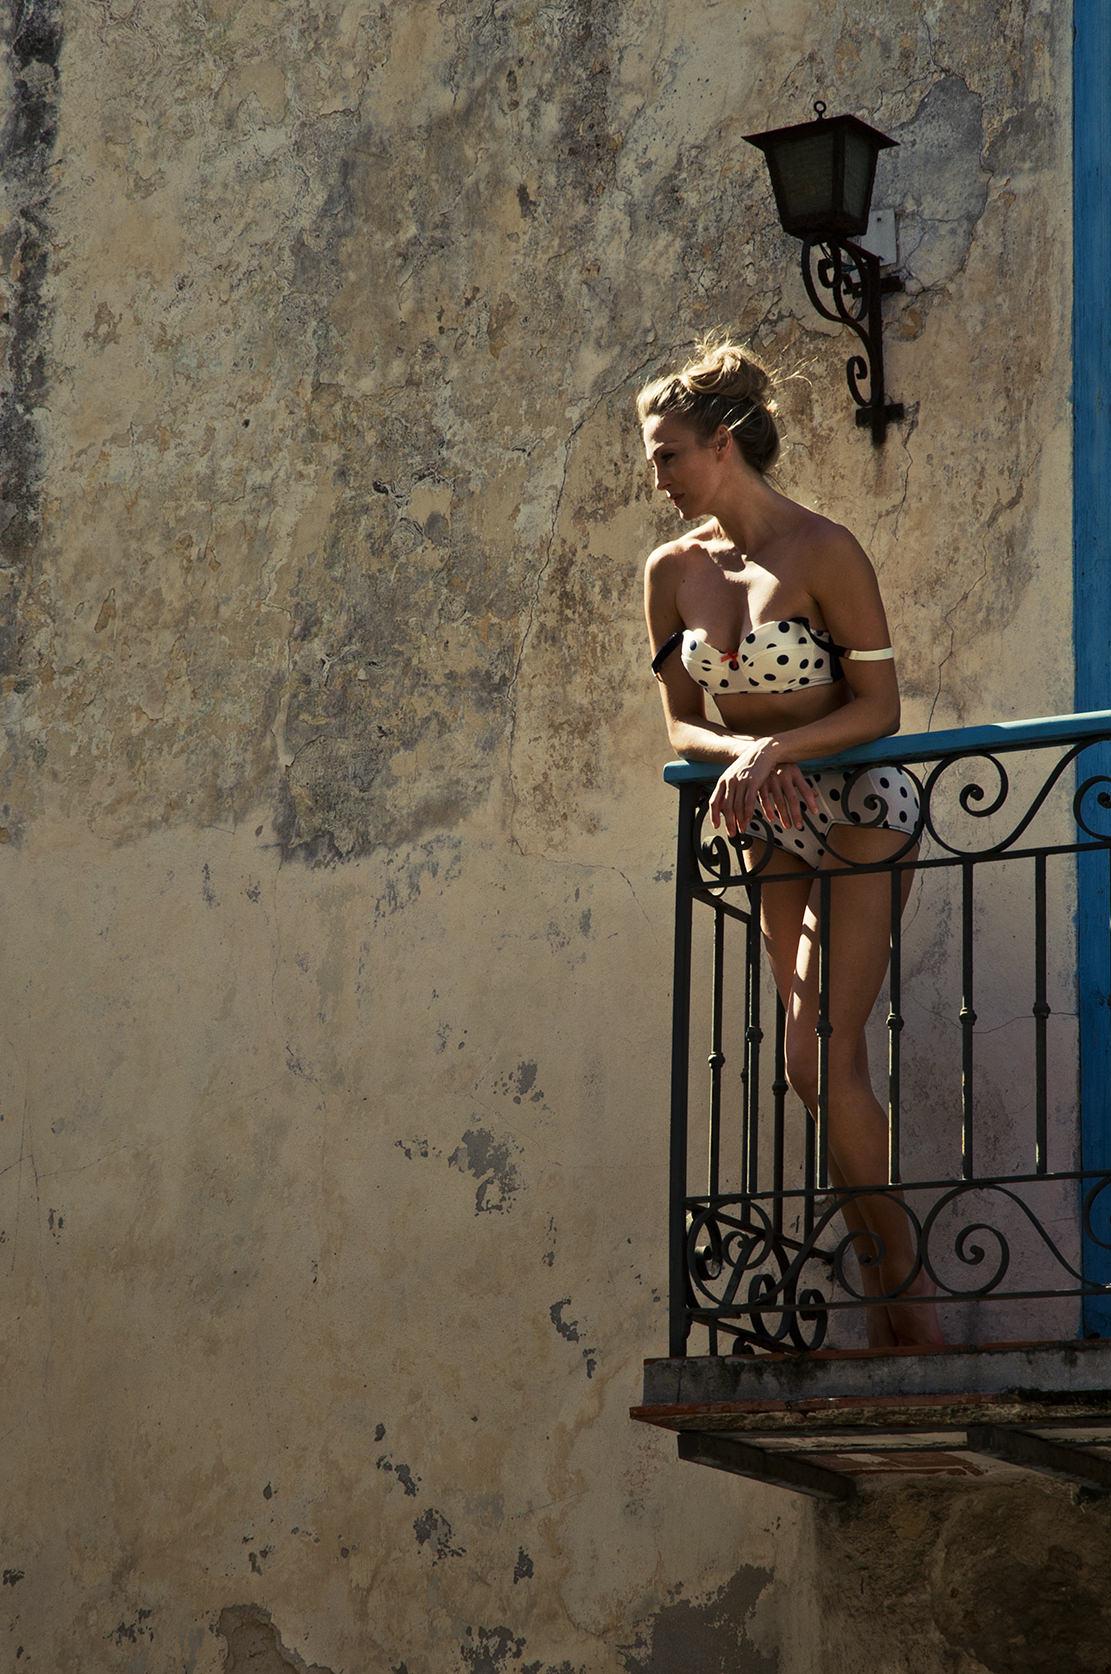 andyq-montagemodels-by-the-balcony-in-havana.jpg